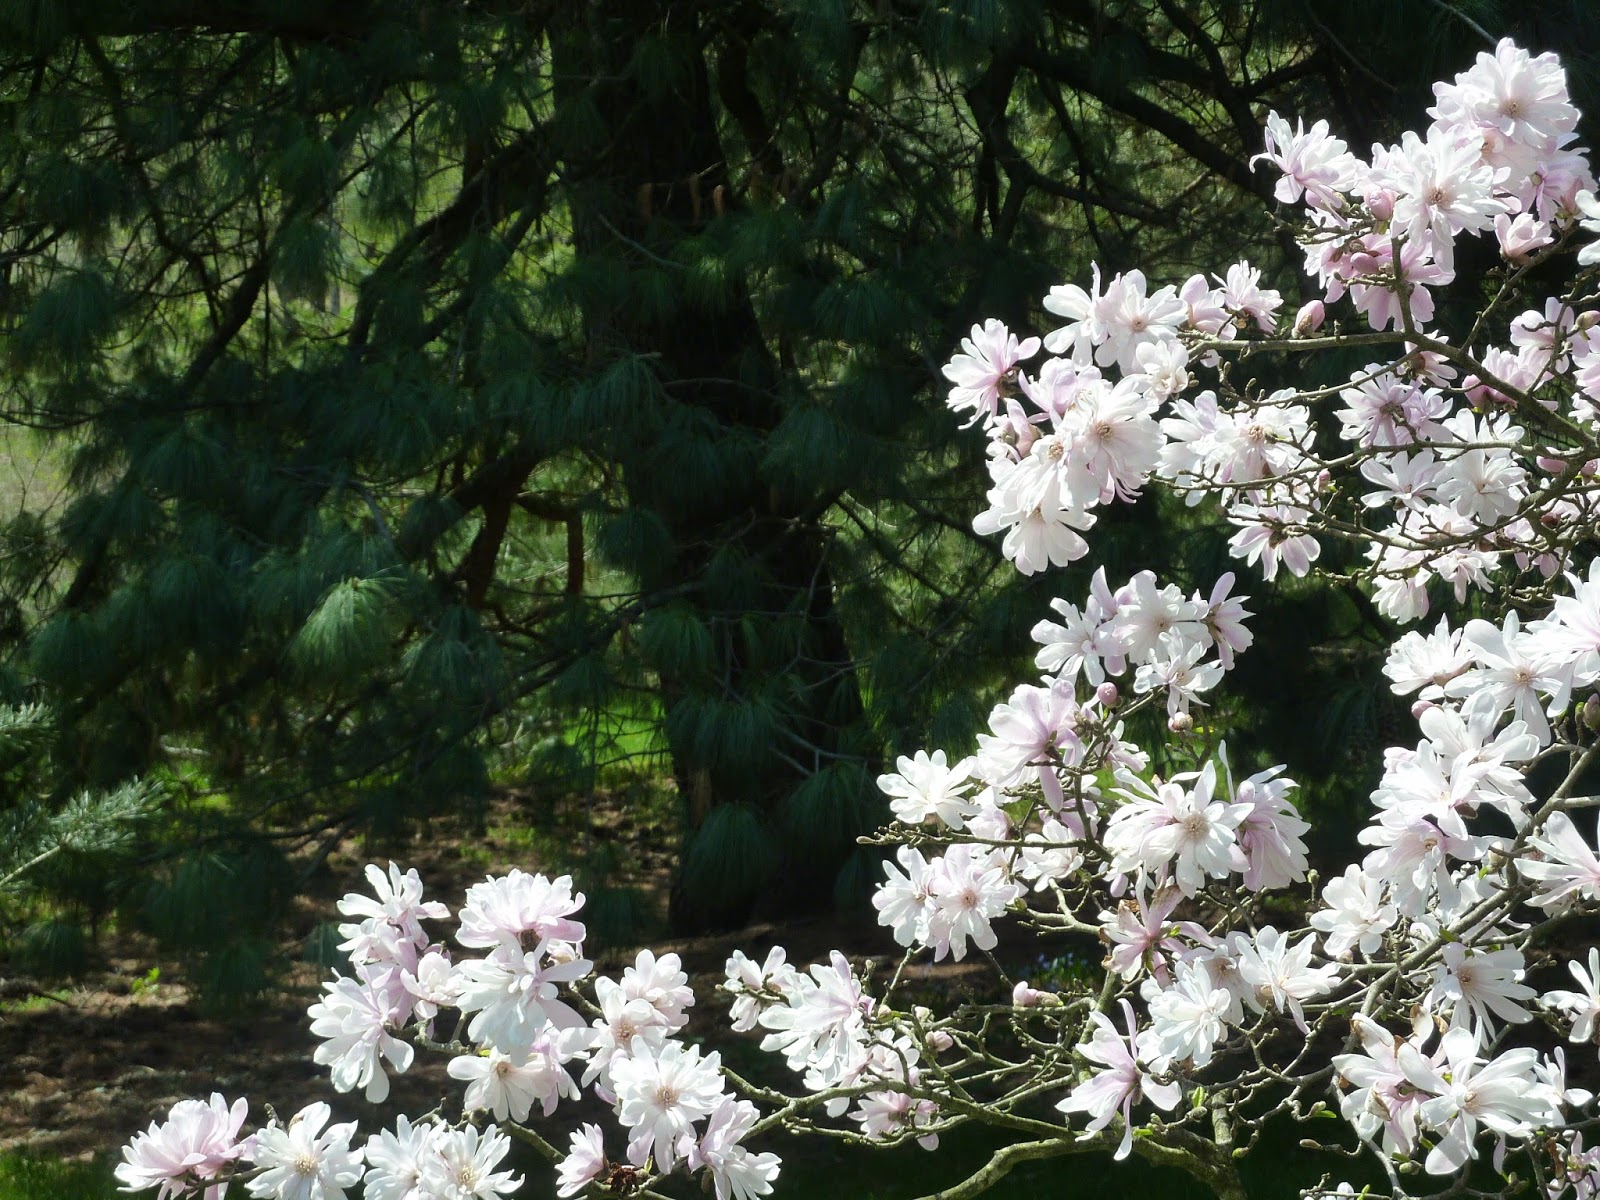 Morris arboretum 3 shade trees for small spaces for Trees for small spaces